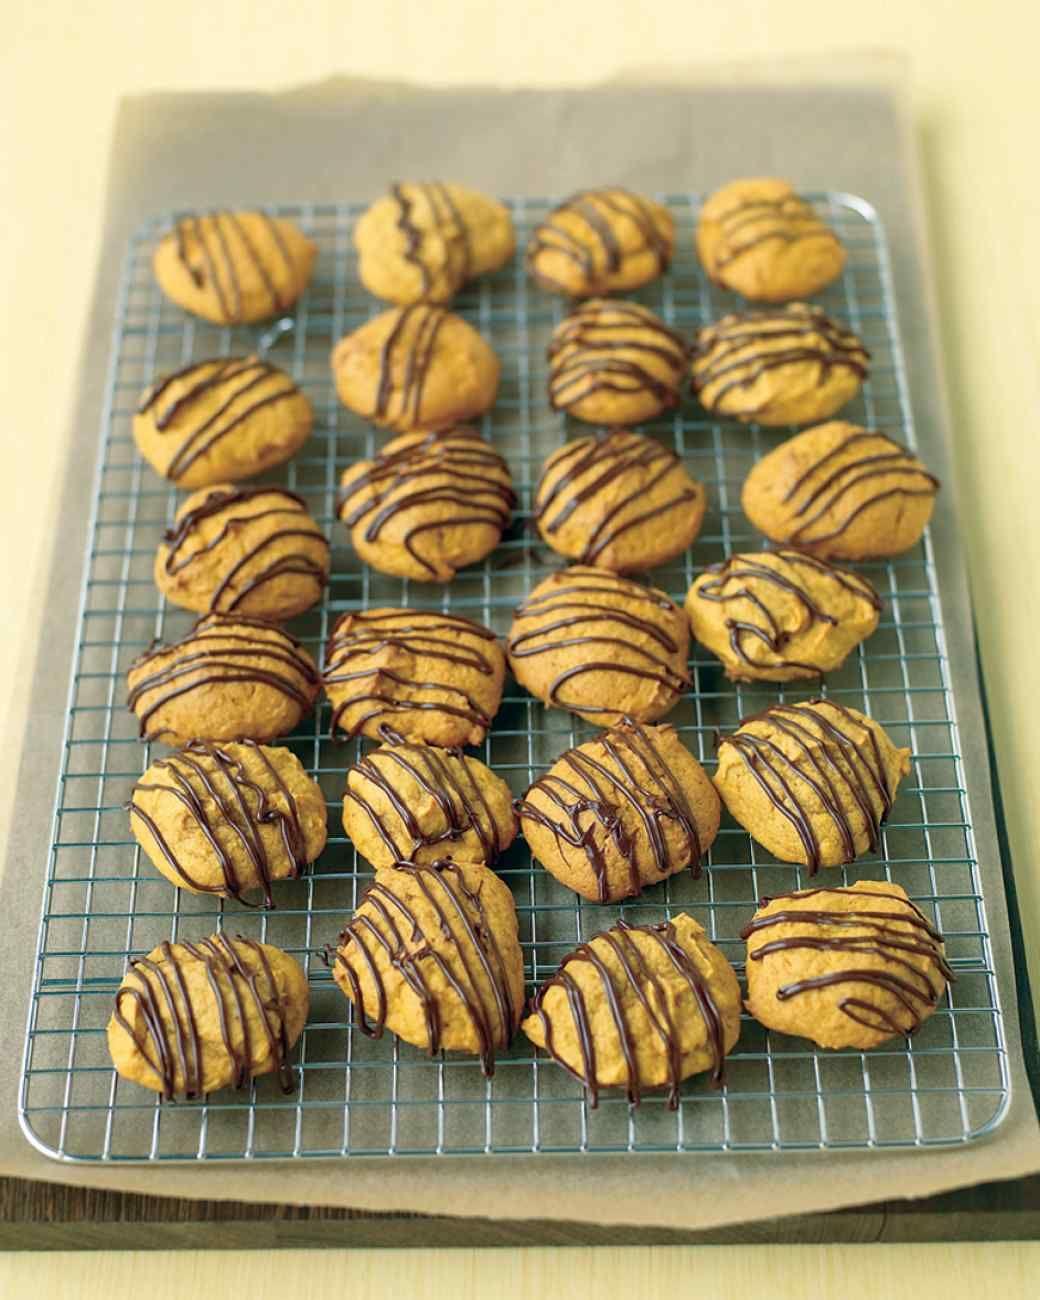 Made with real belgian chocolate this fun chocolate animals make - Chocolate Glazed Pumpkin Cookies